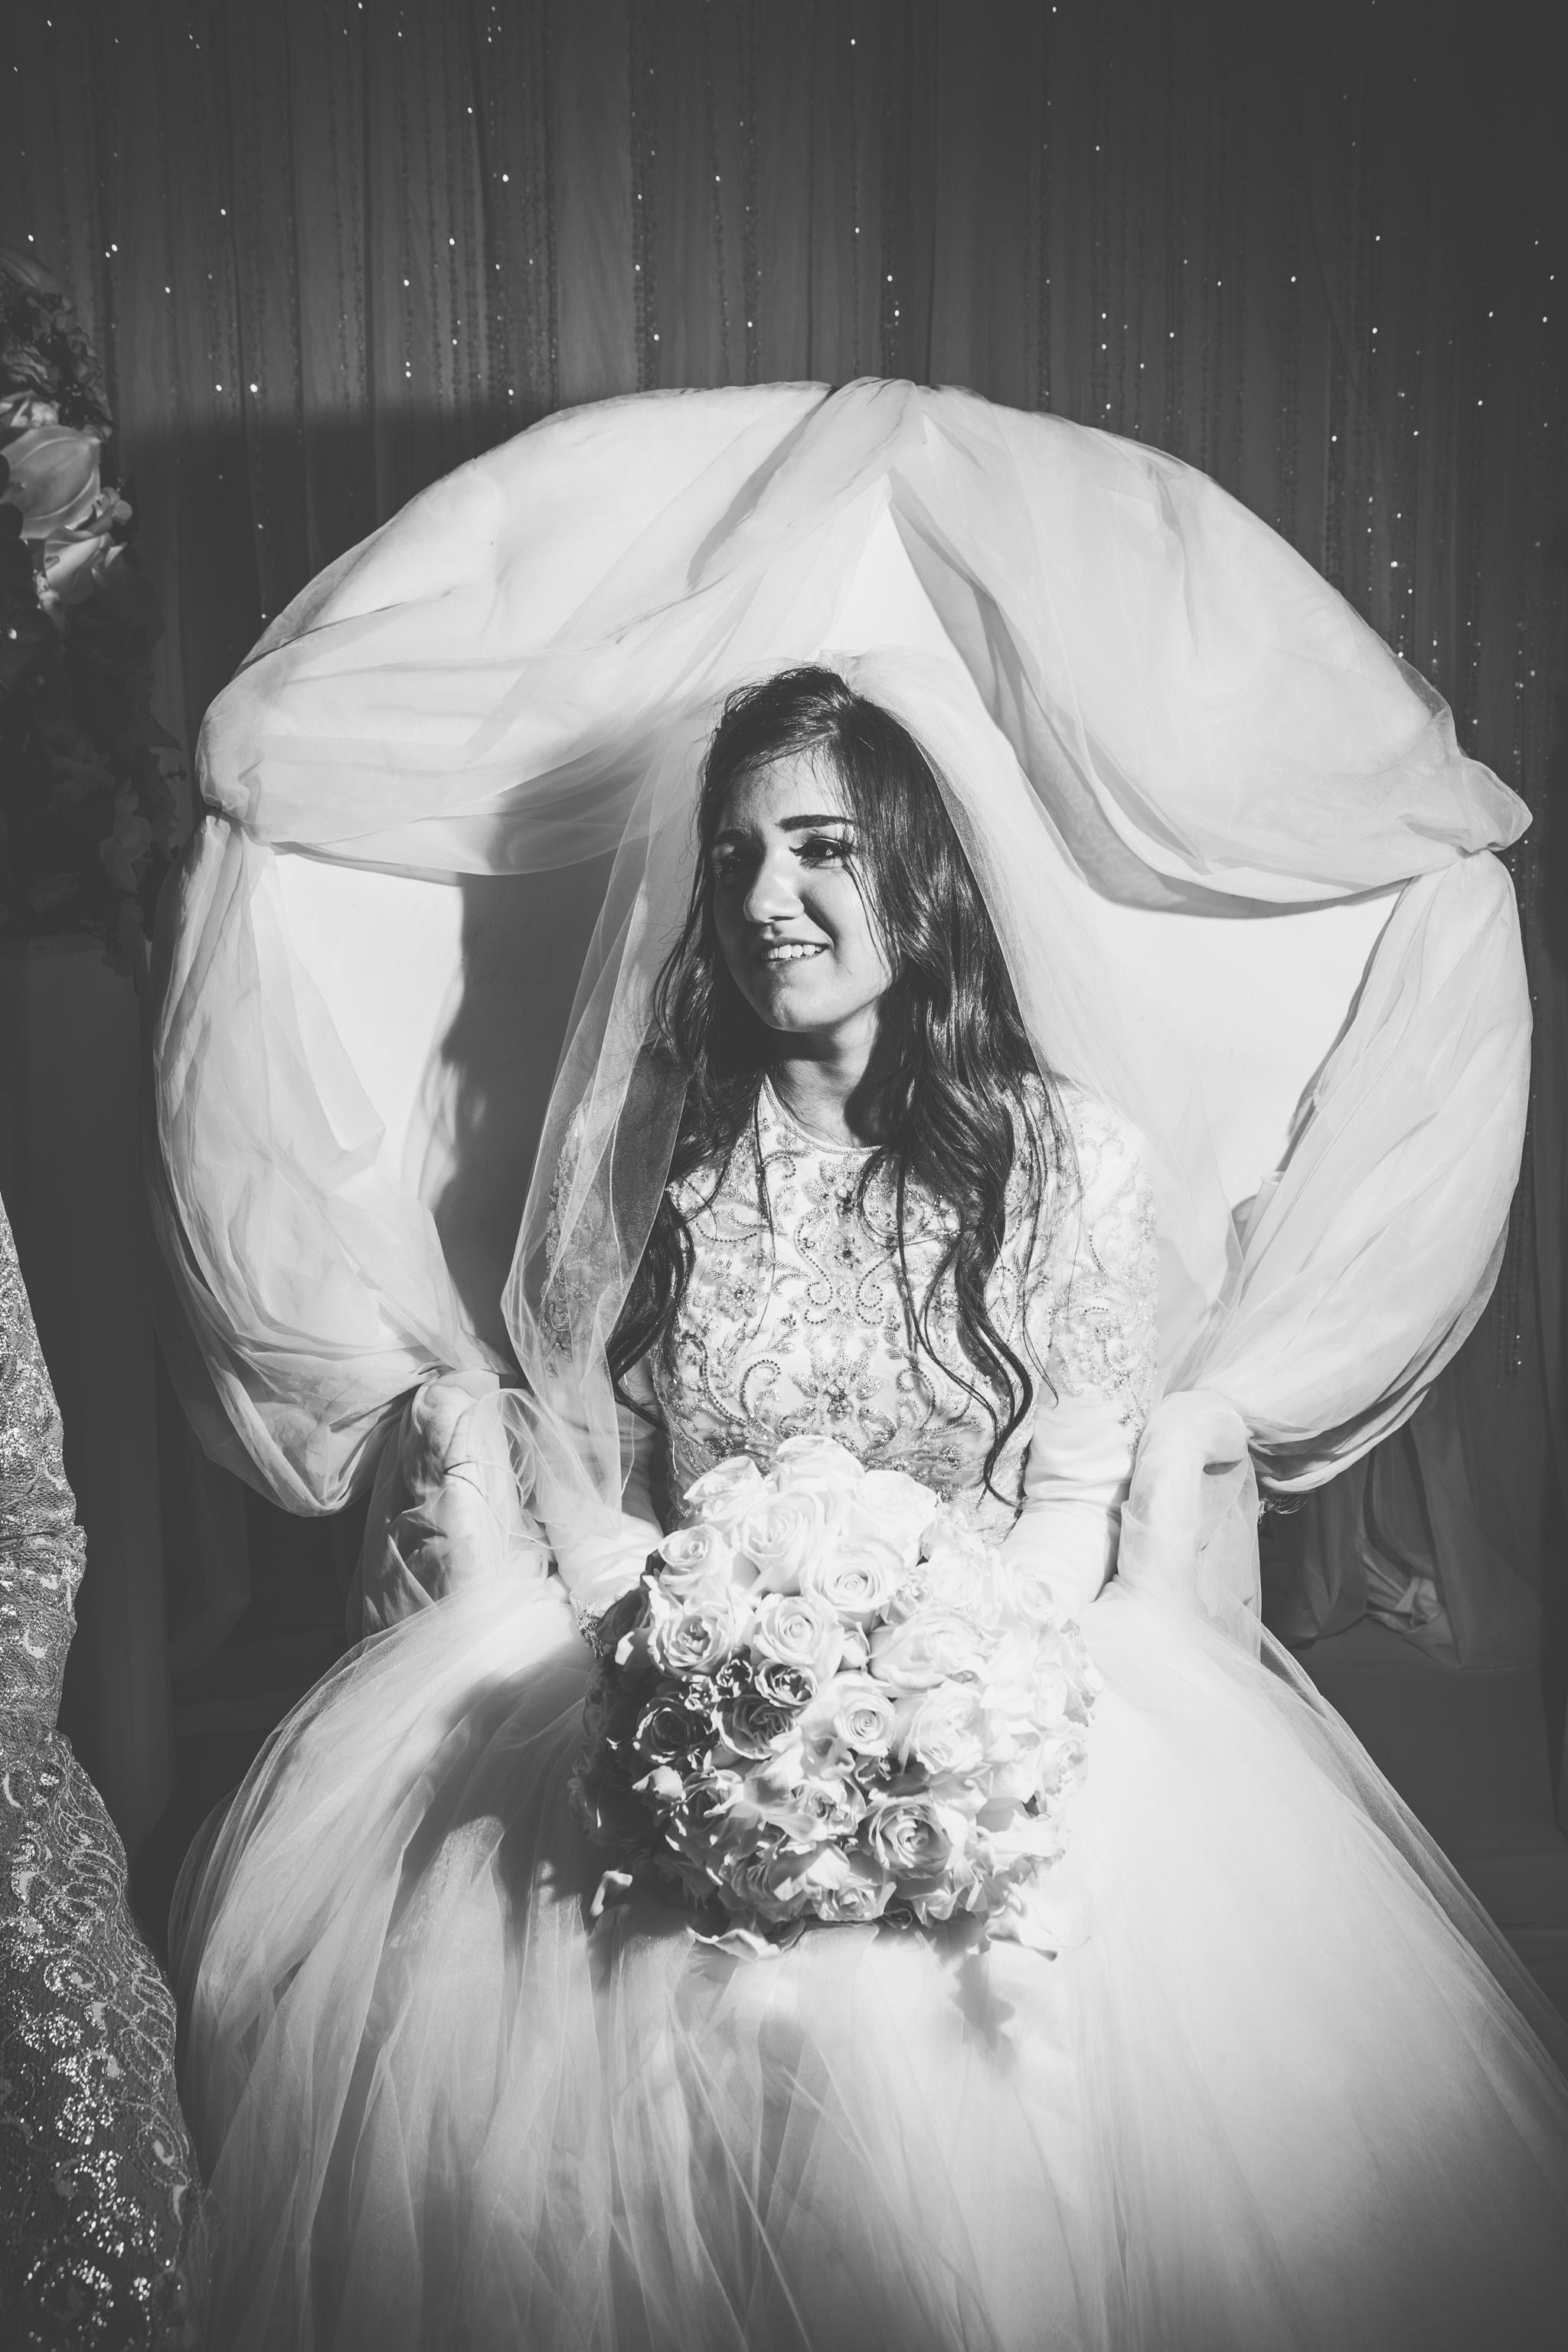 Wedding Iossi and Gitty Khafif  - Eliau Piha studio photography, new york, events, people 770 brooklyn -0303.jpg